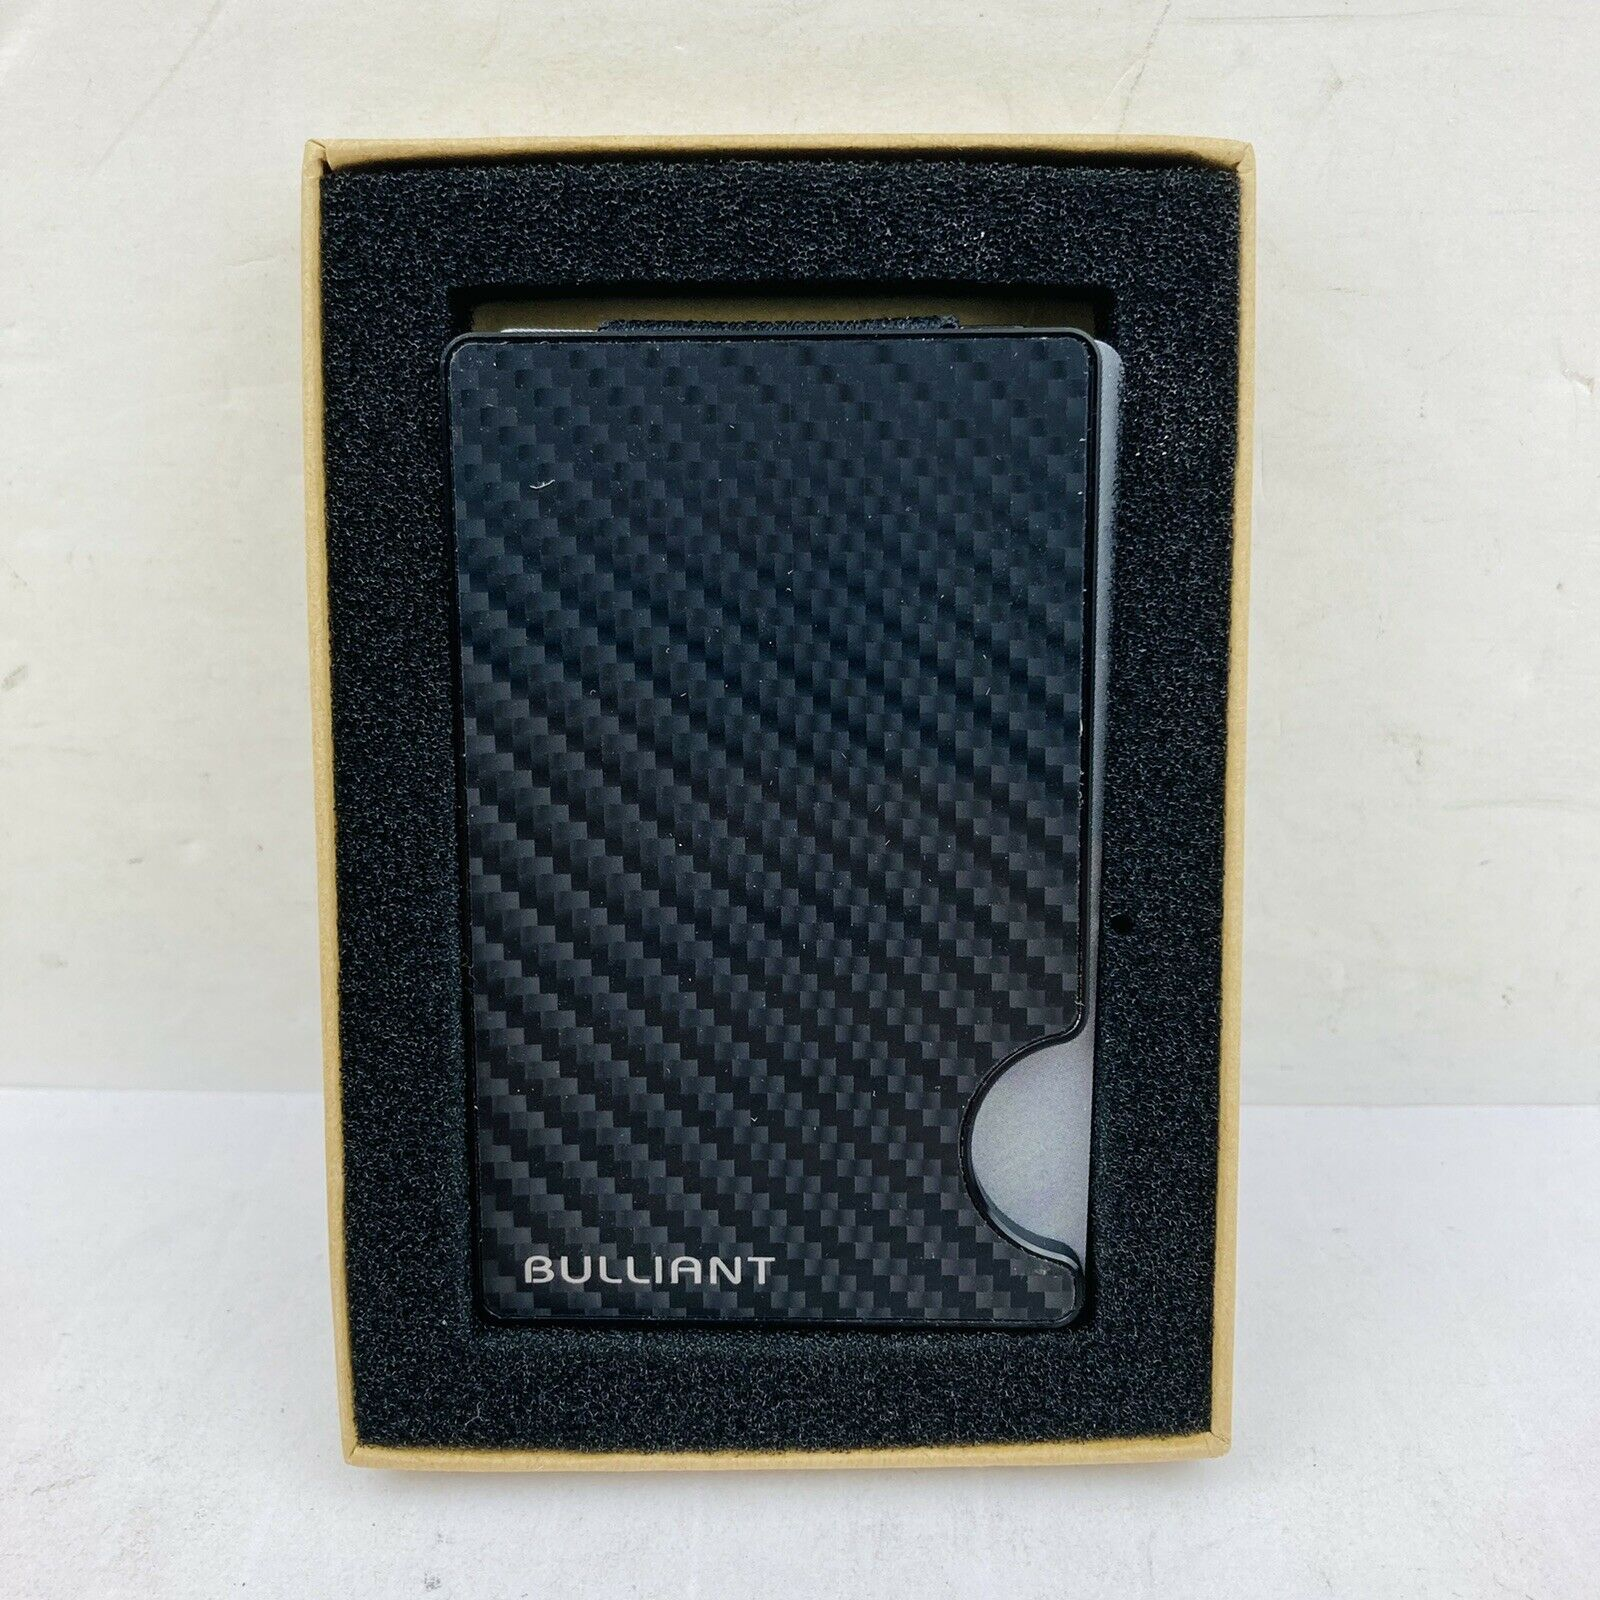 Bulliant Money / Credit Card Clip Carbon Fiber Wallet New In Box